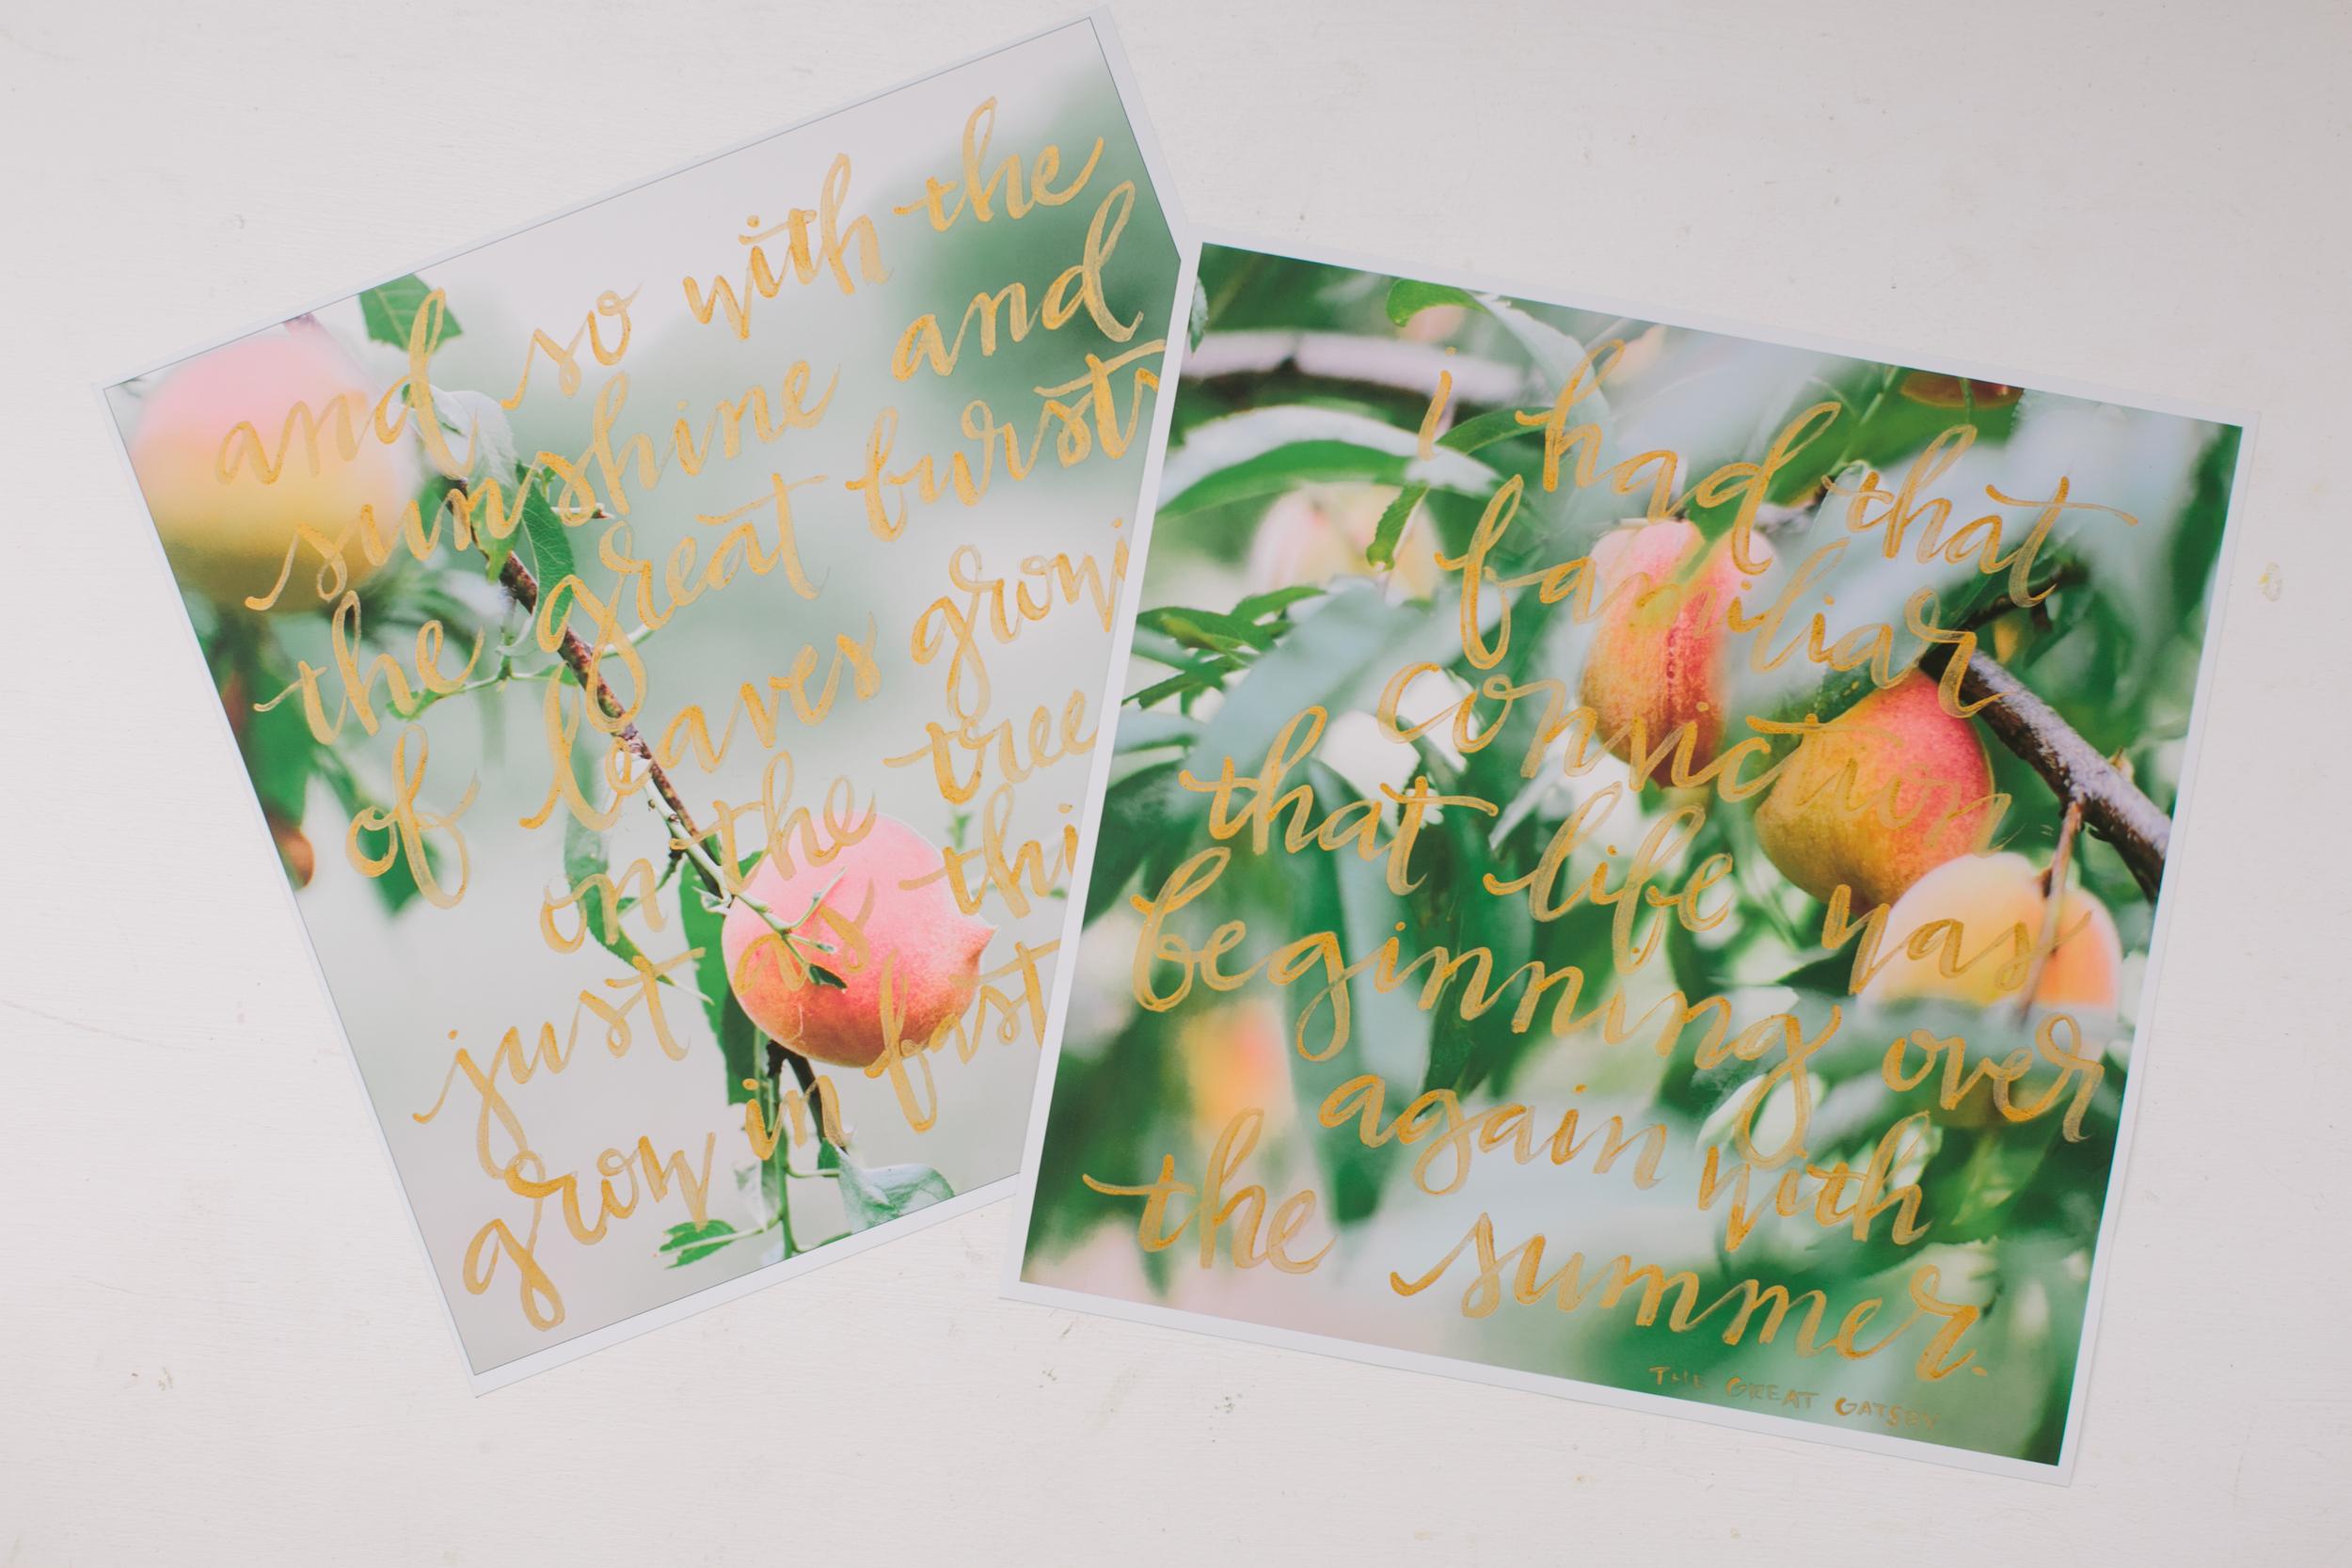 Kathryn-McCrary-Photography-Jenn-Gietzen-Write-On-Designs-Market-Collab-Peaches-113.jpg